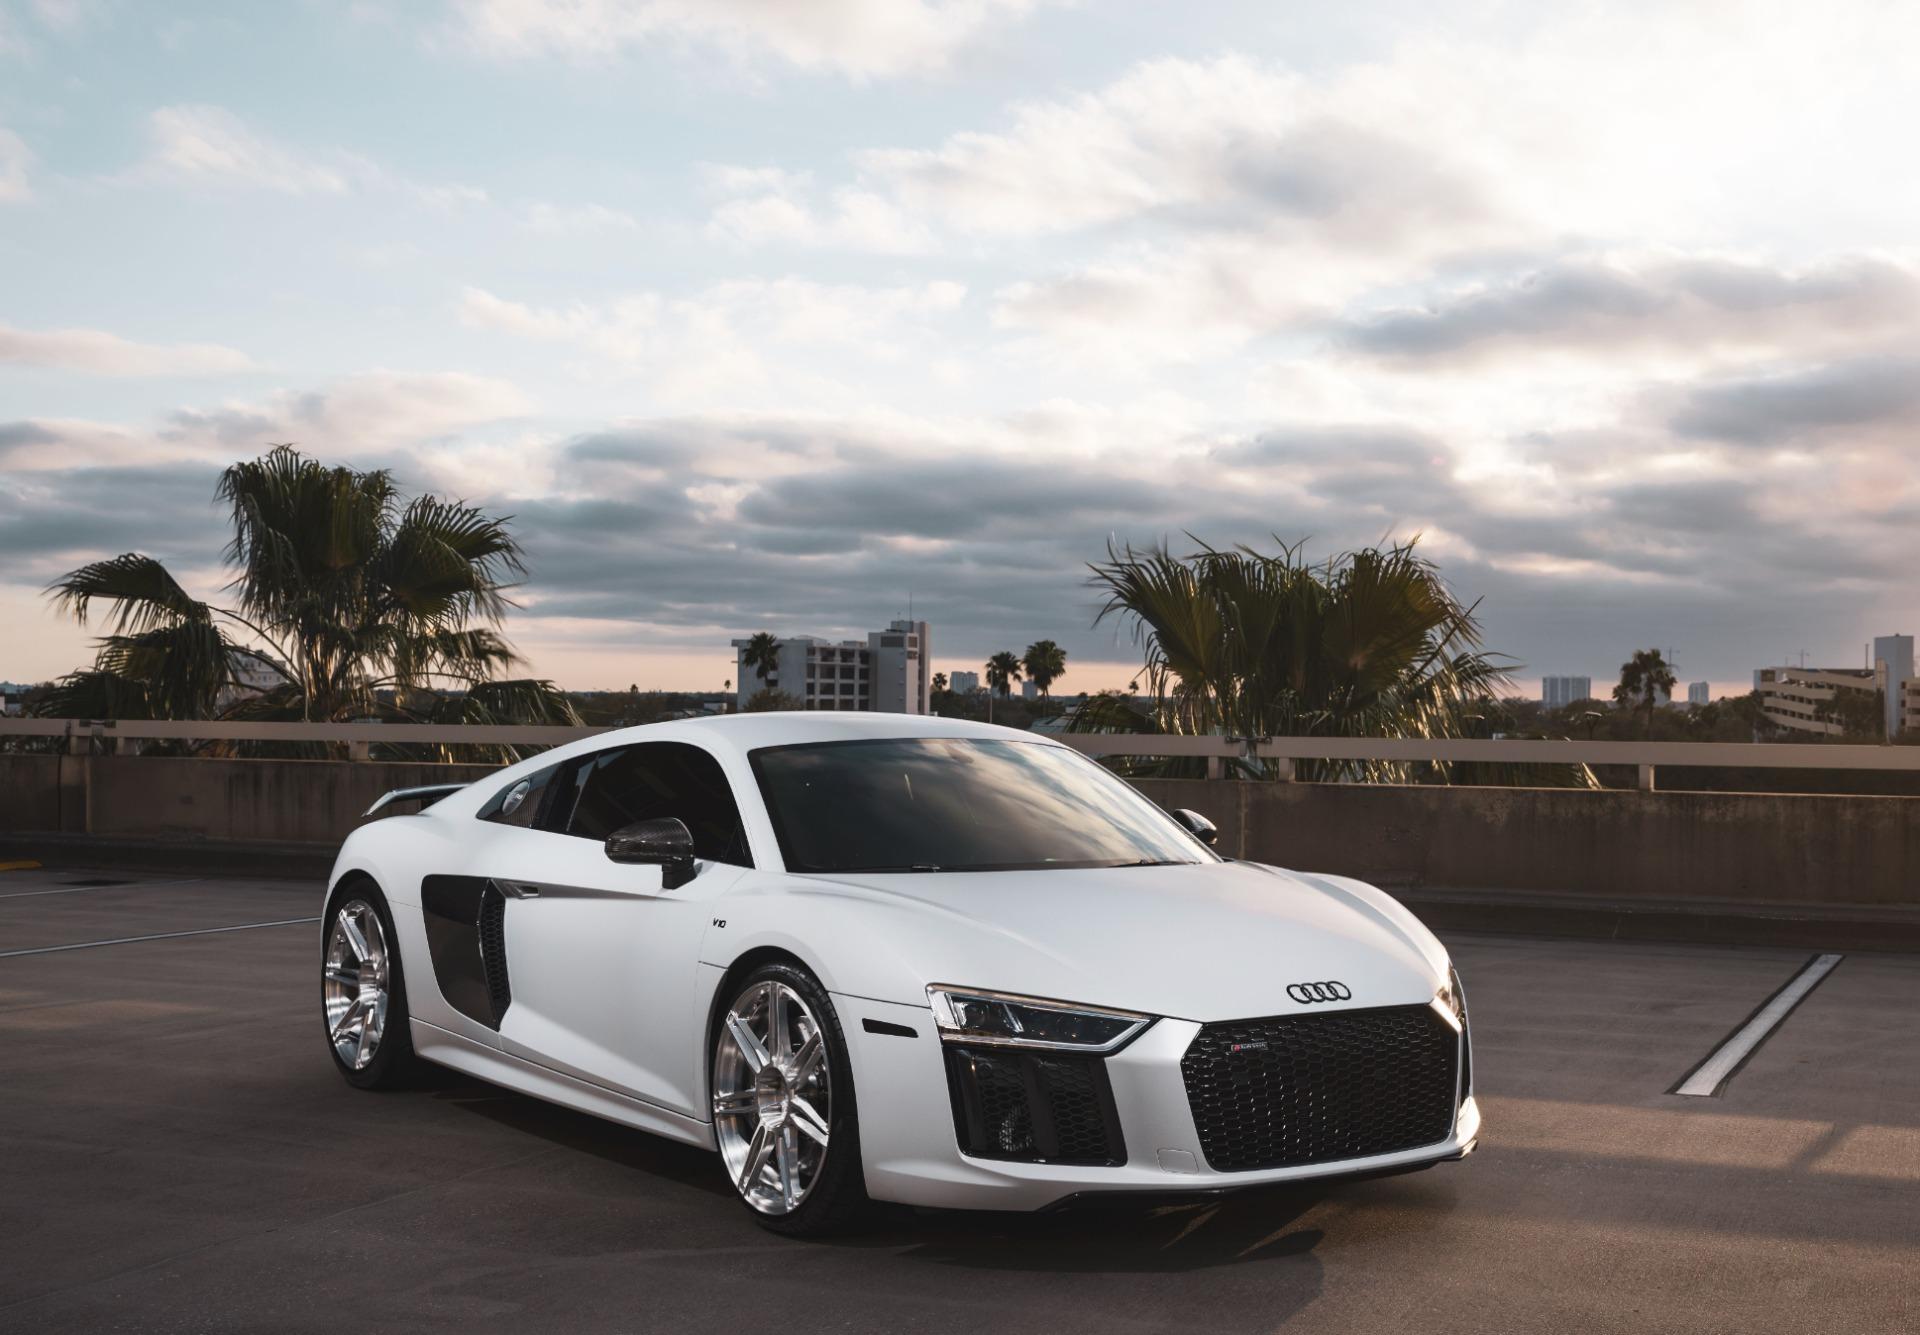 Used-2017-Audi-R8-52-quattro-V10-Plus-MSRP-209595-UPGRADES-DIAMOND-STITCHED-LEATHER